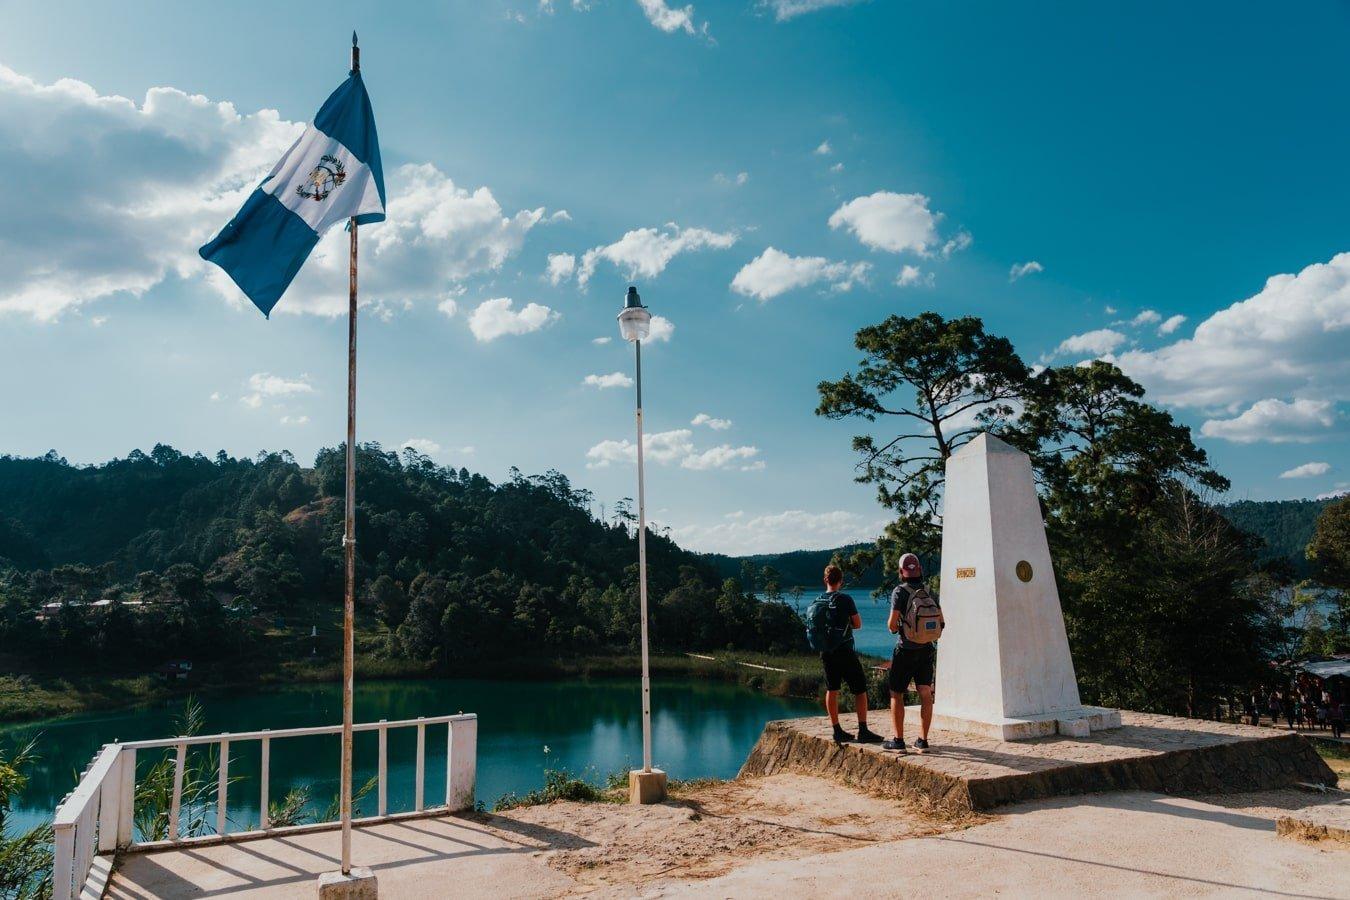 lago internacional border between mexico and guatemala in chiapas